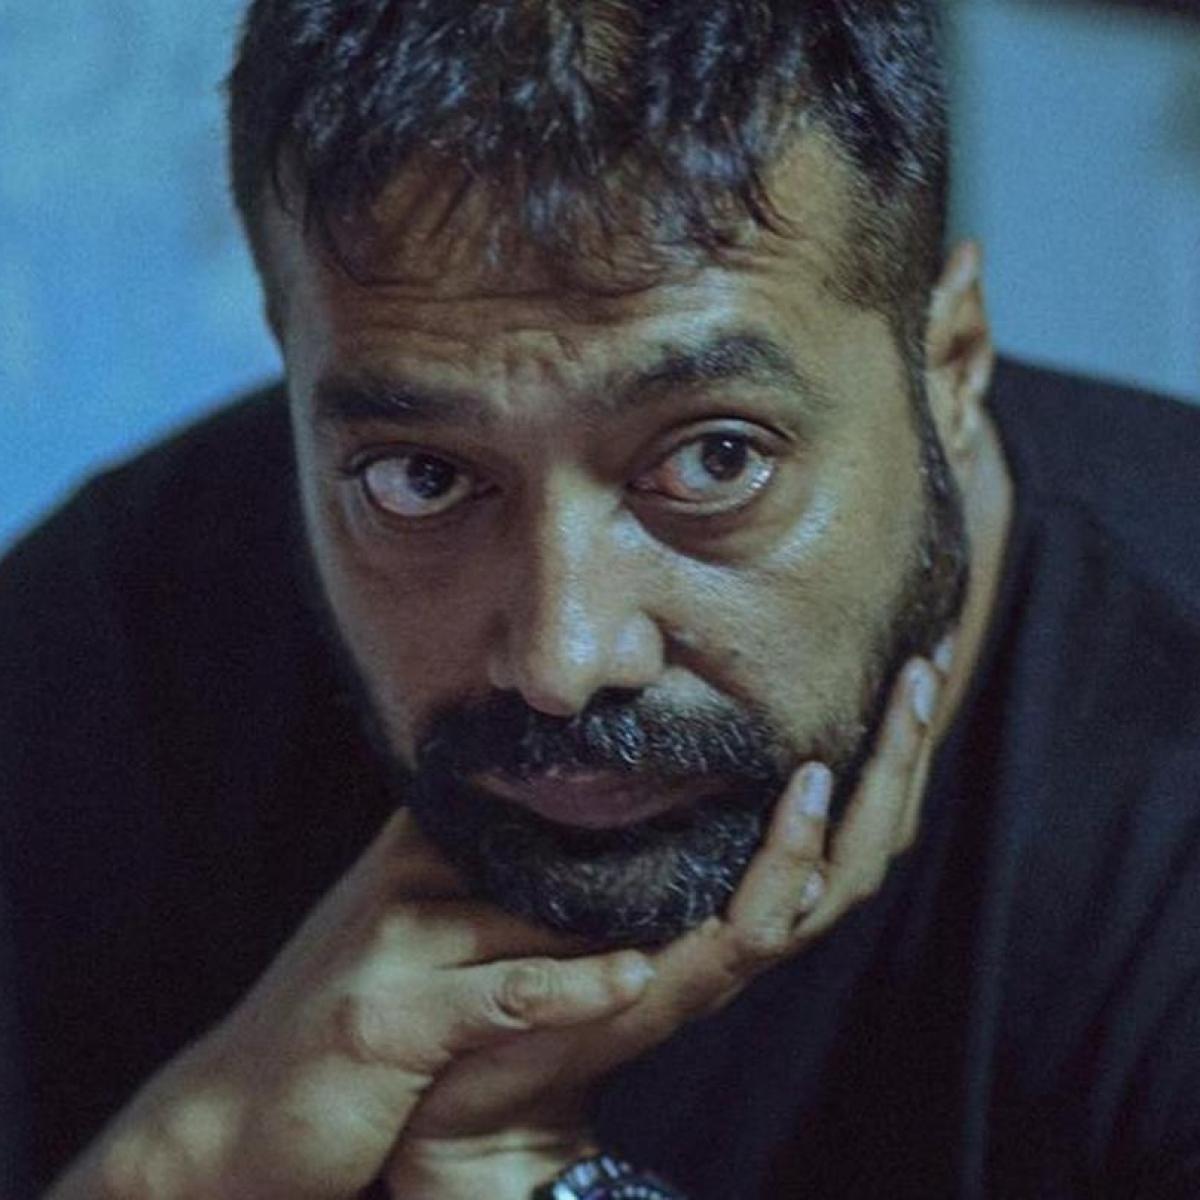 Anurag Kashyap summoned by Mumbai Police after actress Payal Ghosh accuses him of sexual assault